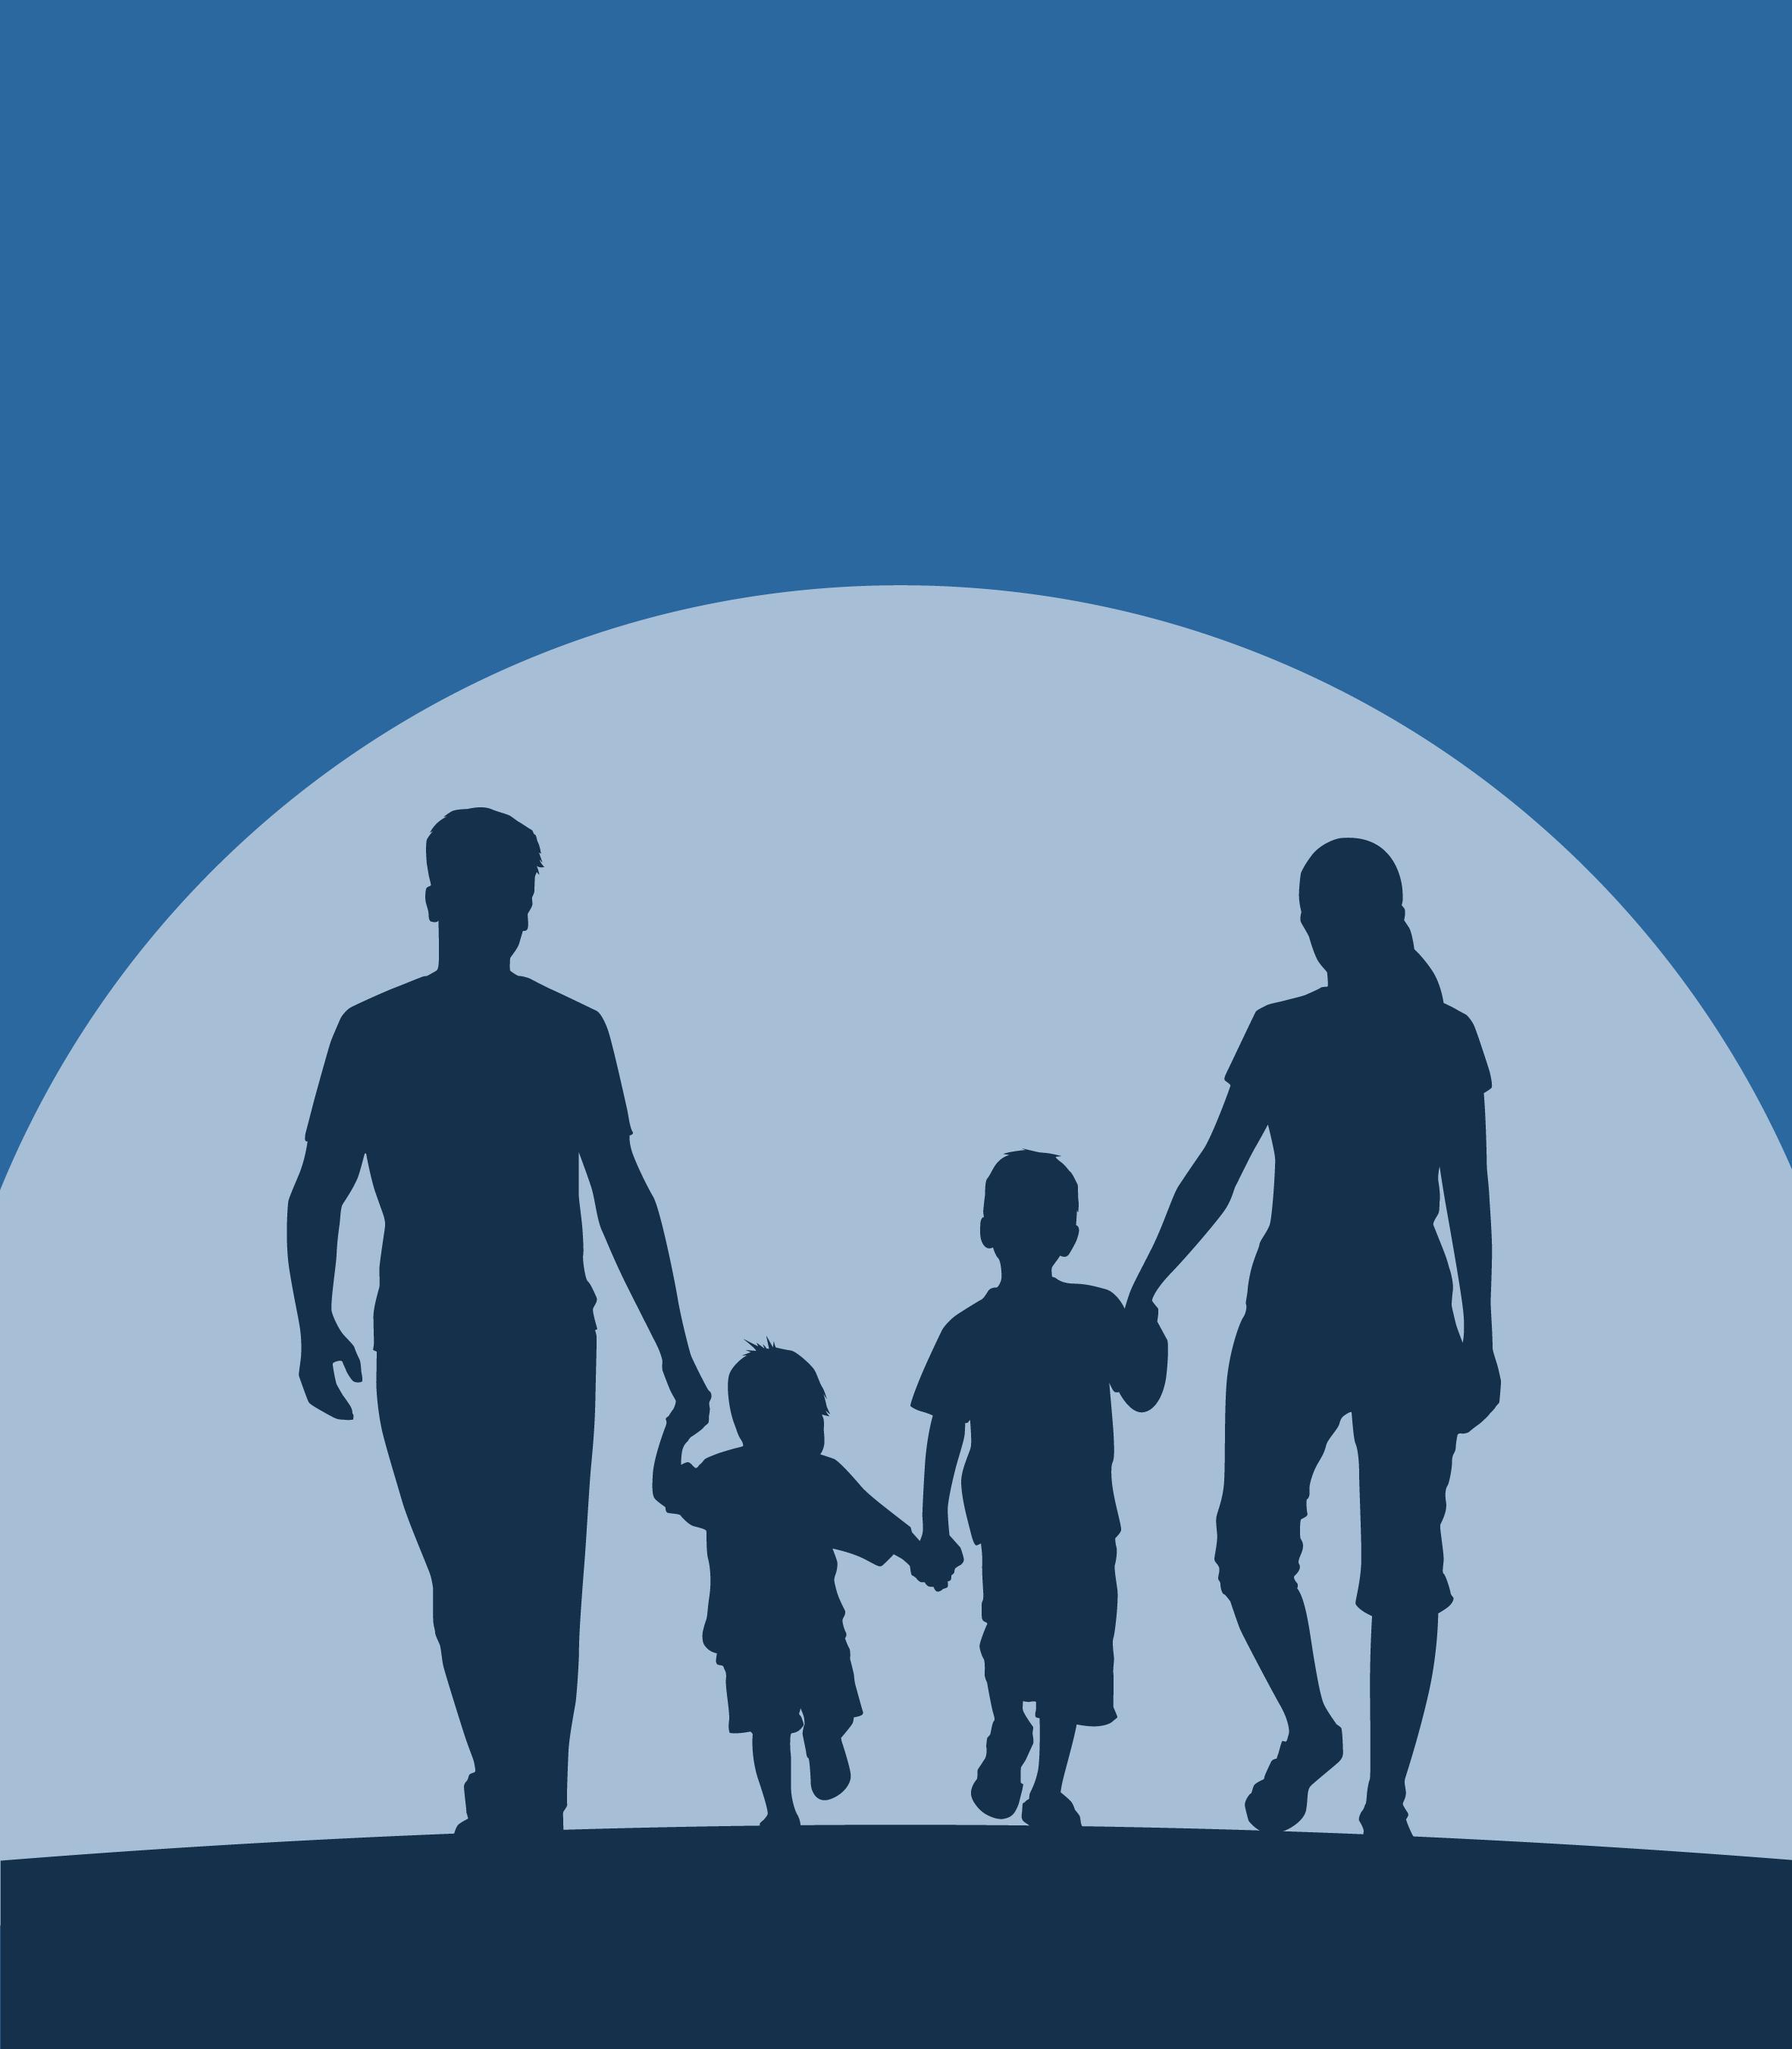 Illustratie van dam & Lolkema - Familierecht